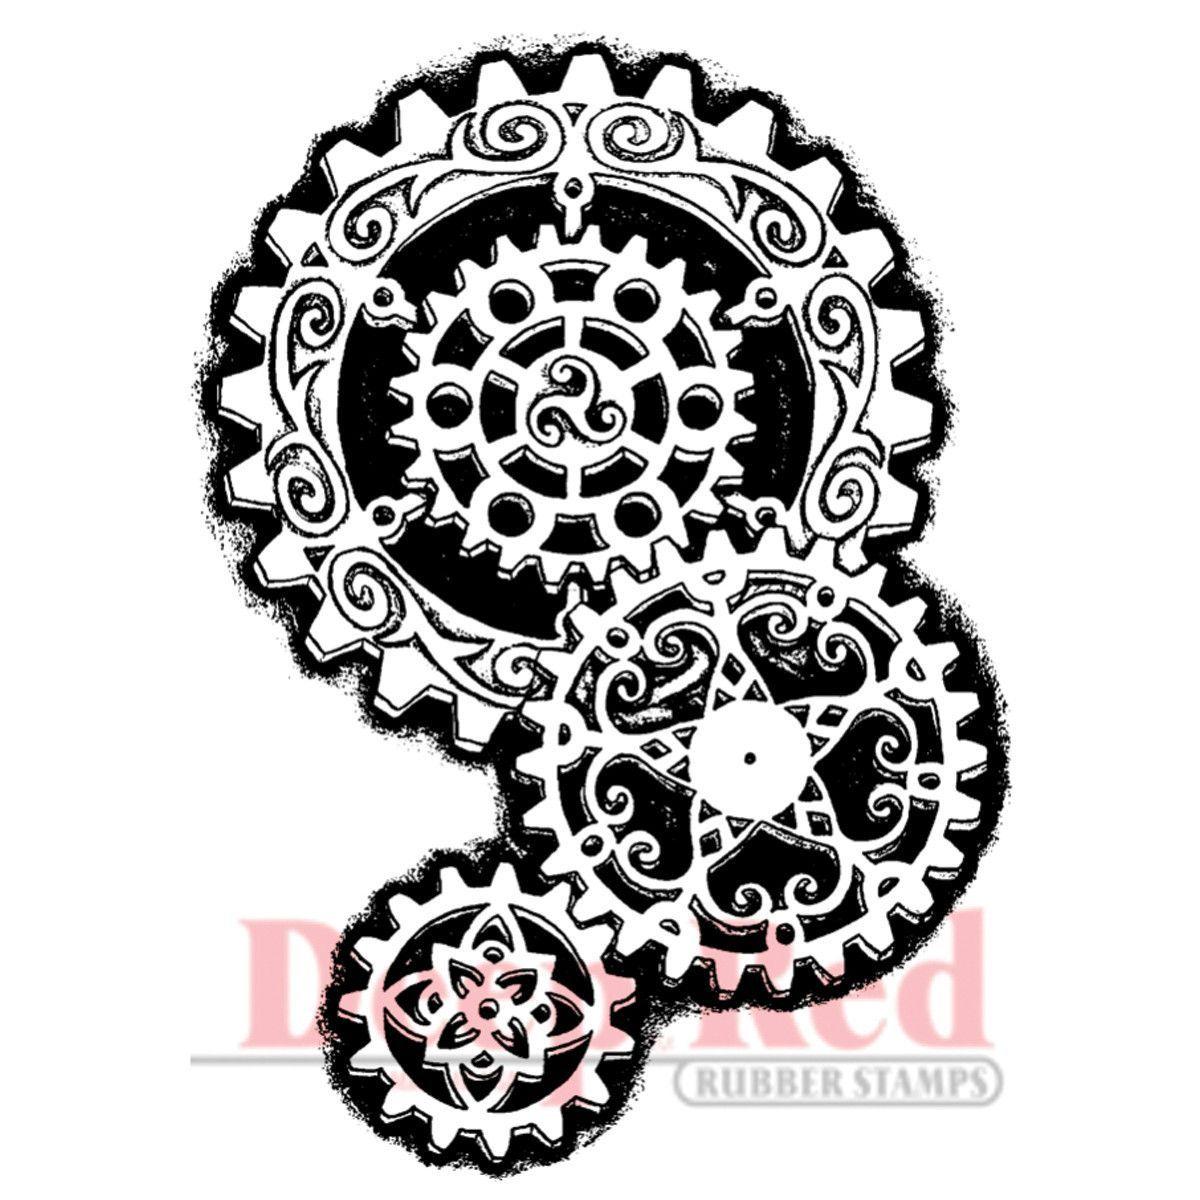 Deep Red Stamp - Steampunk Gears